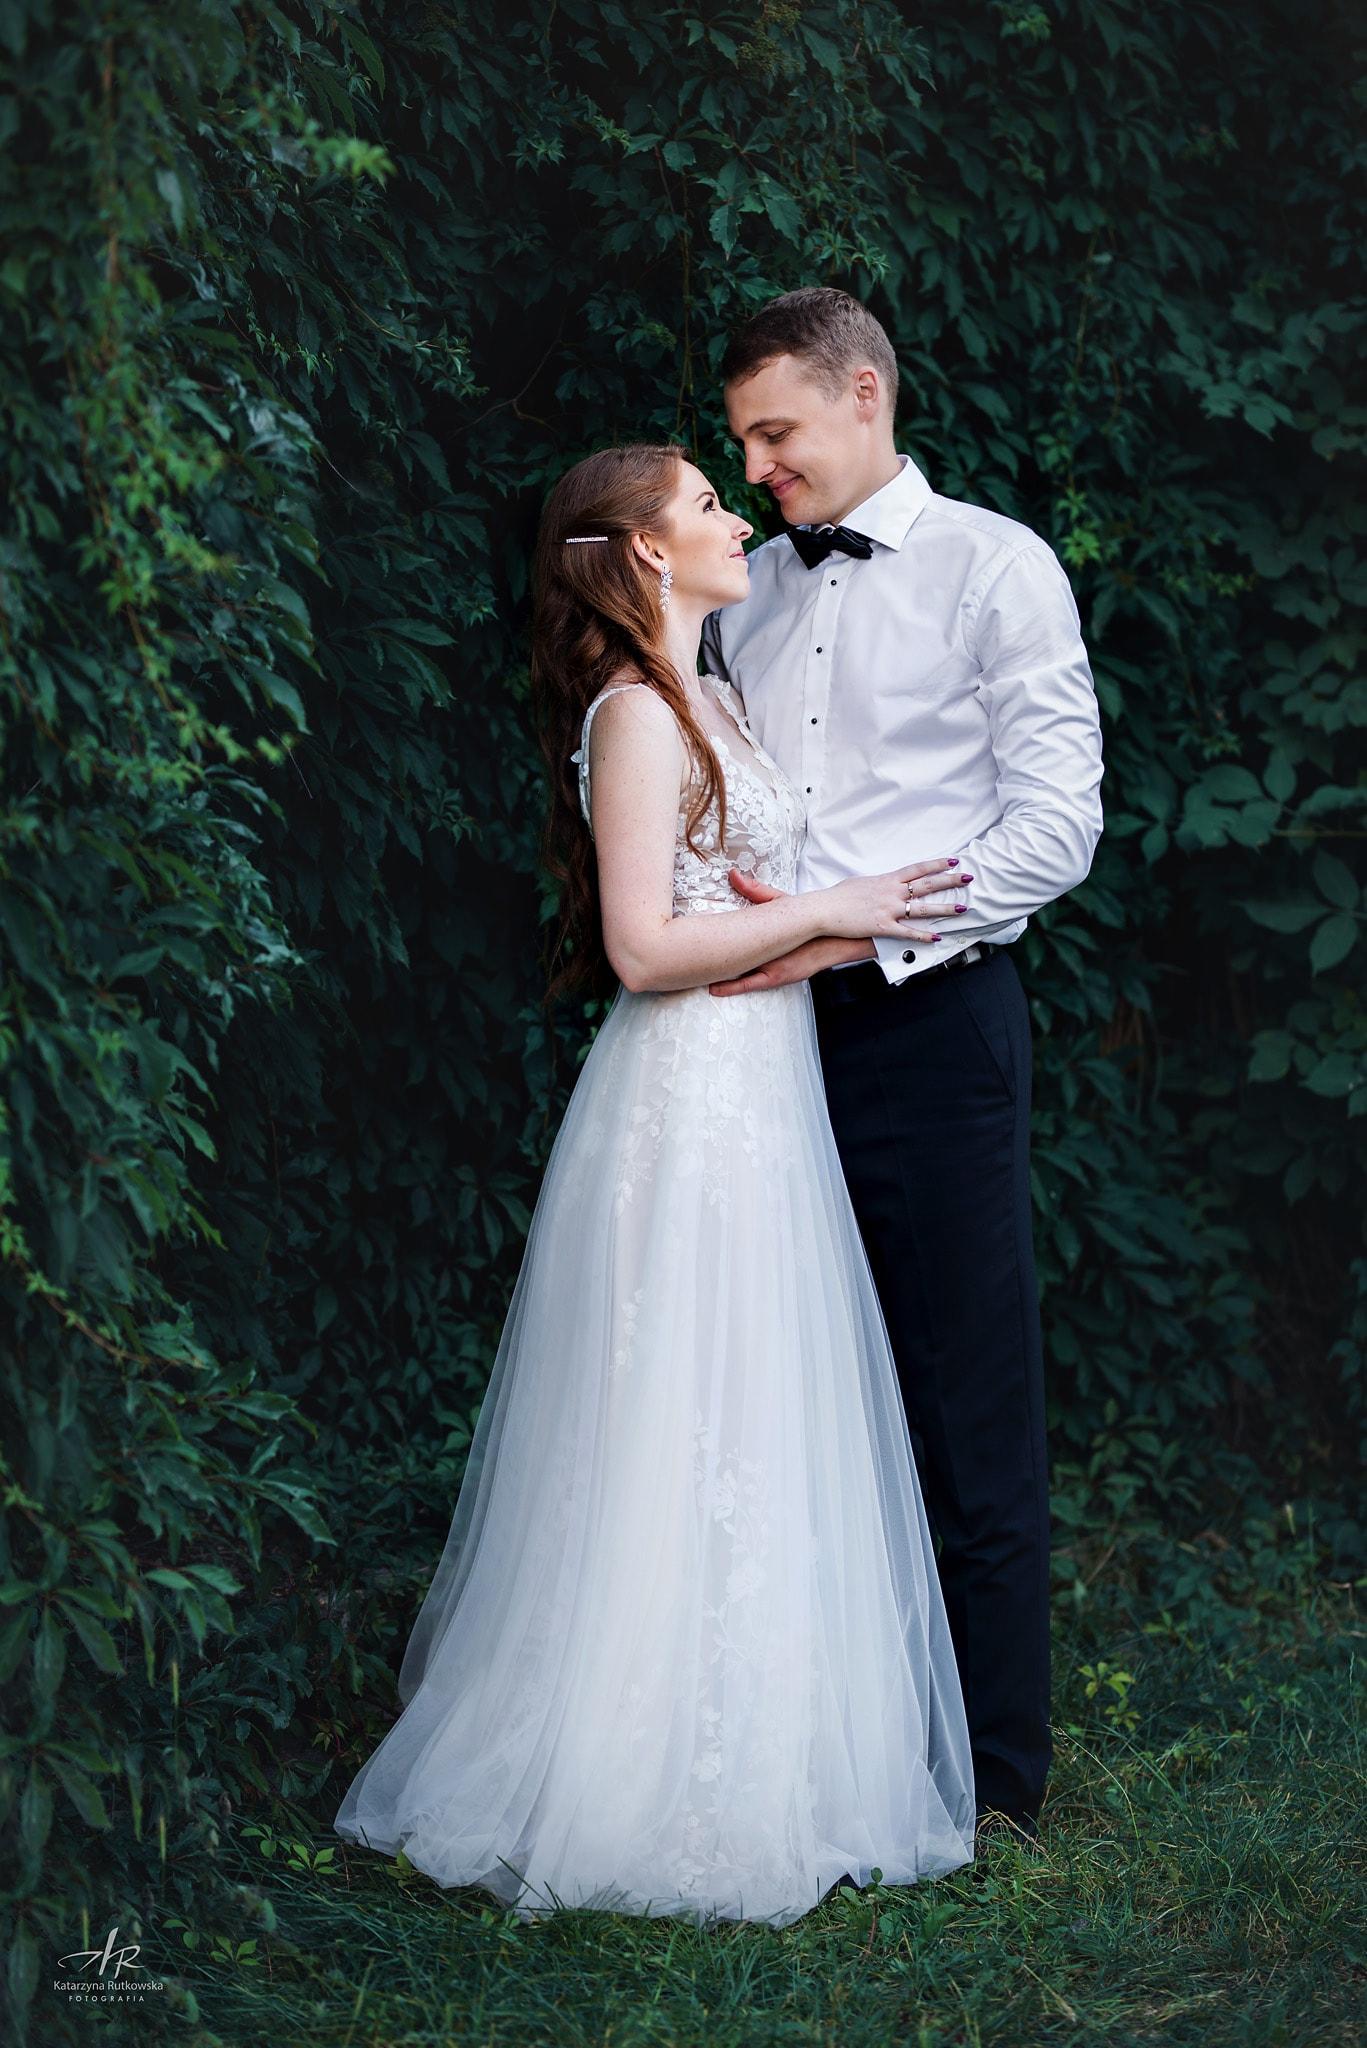 Sesja ślubna - Sesja zdjęciowa